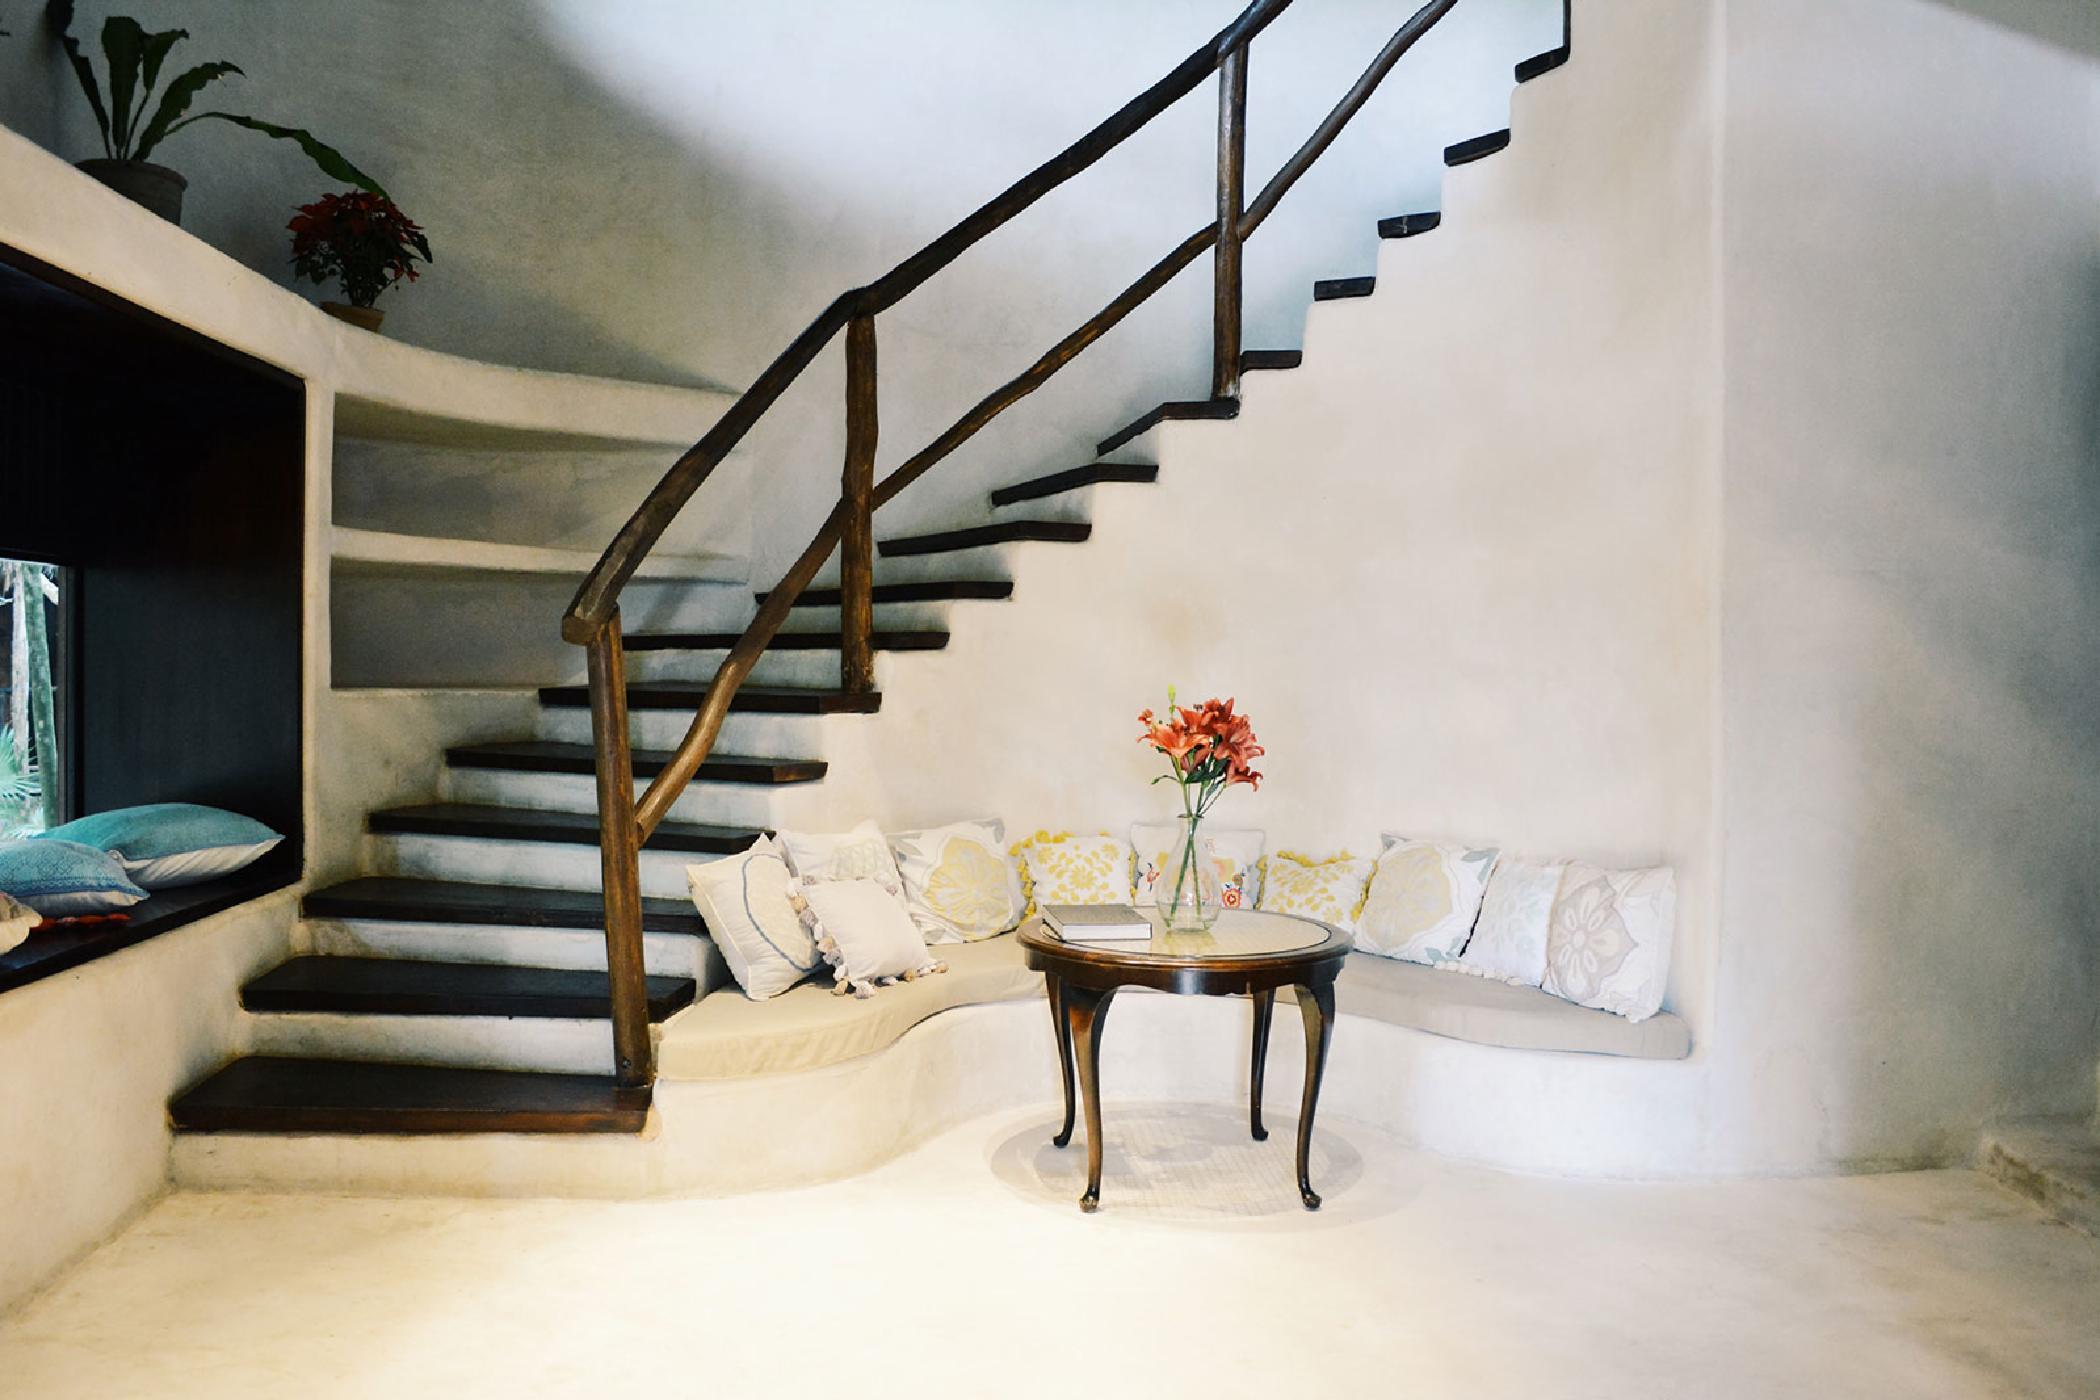 Maya_Luxe_Riviera_Maya_Luxury_Villas_Experiences_Hotel_Zone_Tulum_Beach_5_Bedrooms_Casa_Palapa_10.jpg